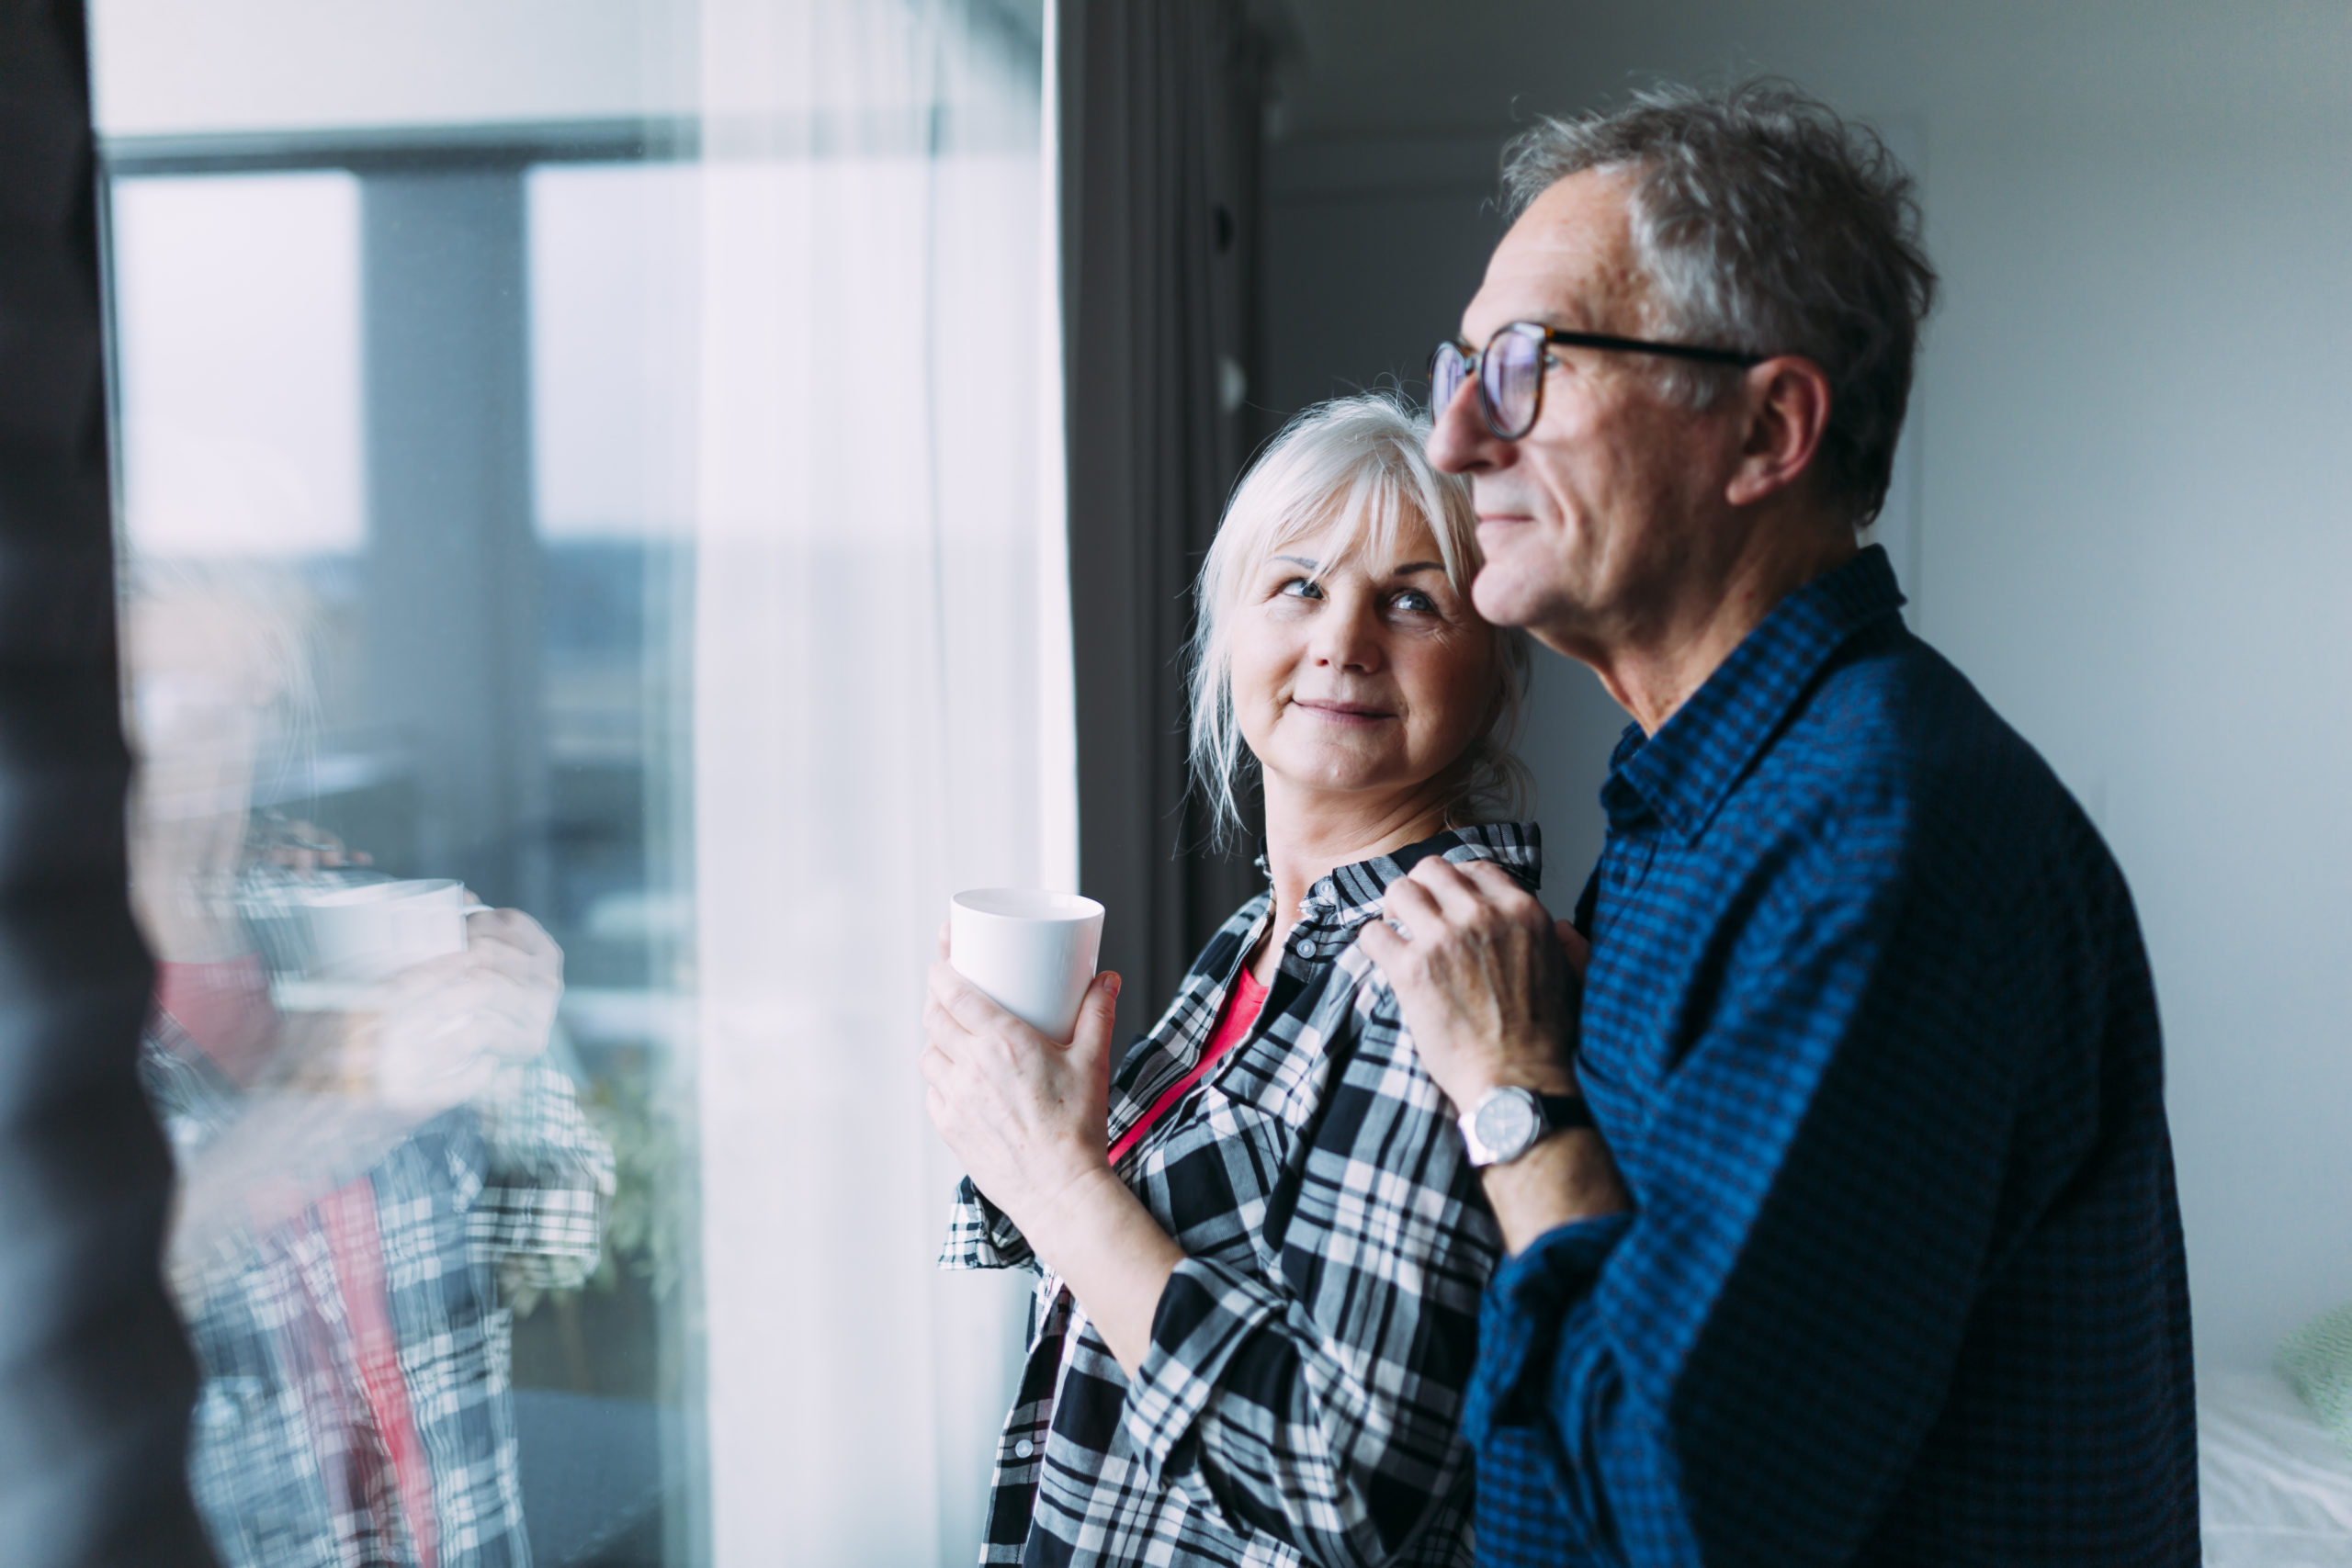 elderly-couple-retirement-home-front-window